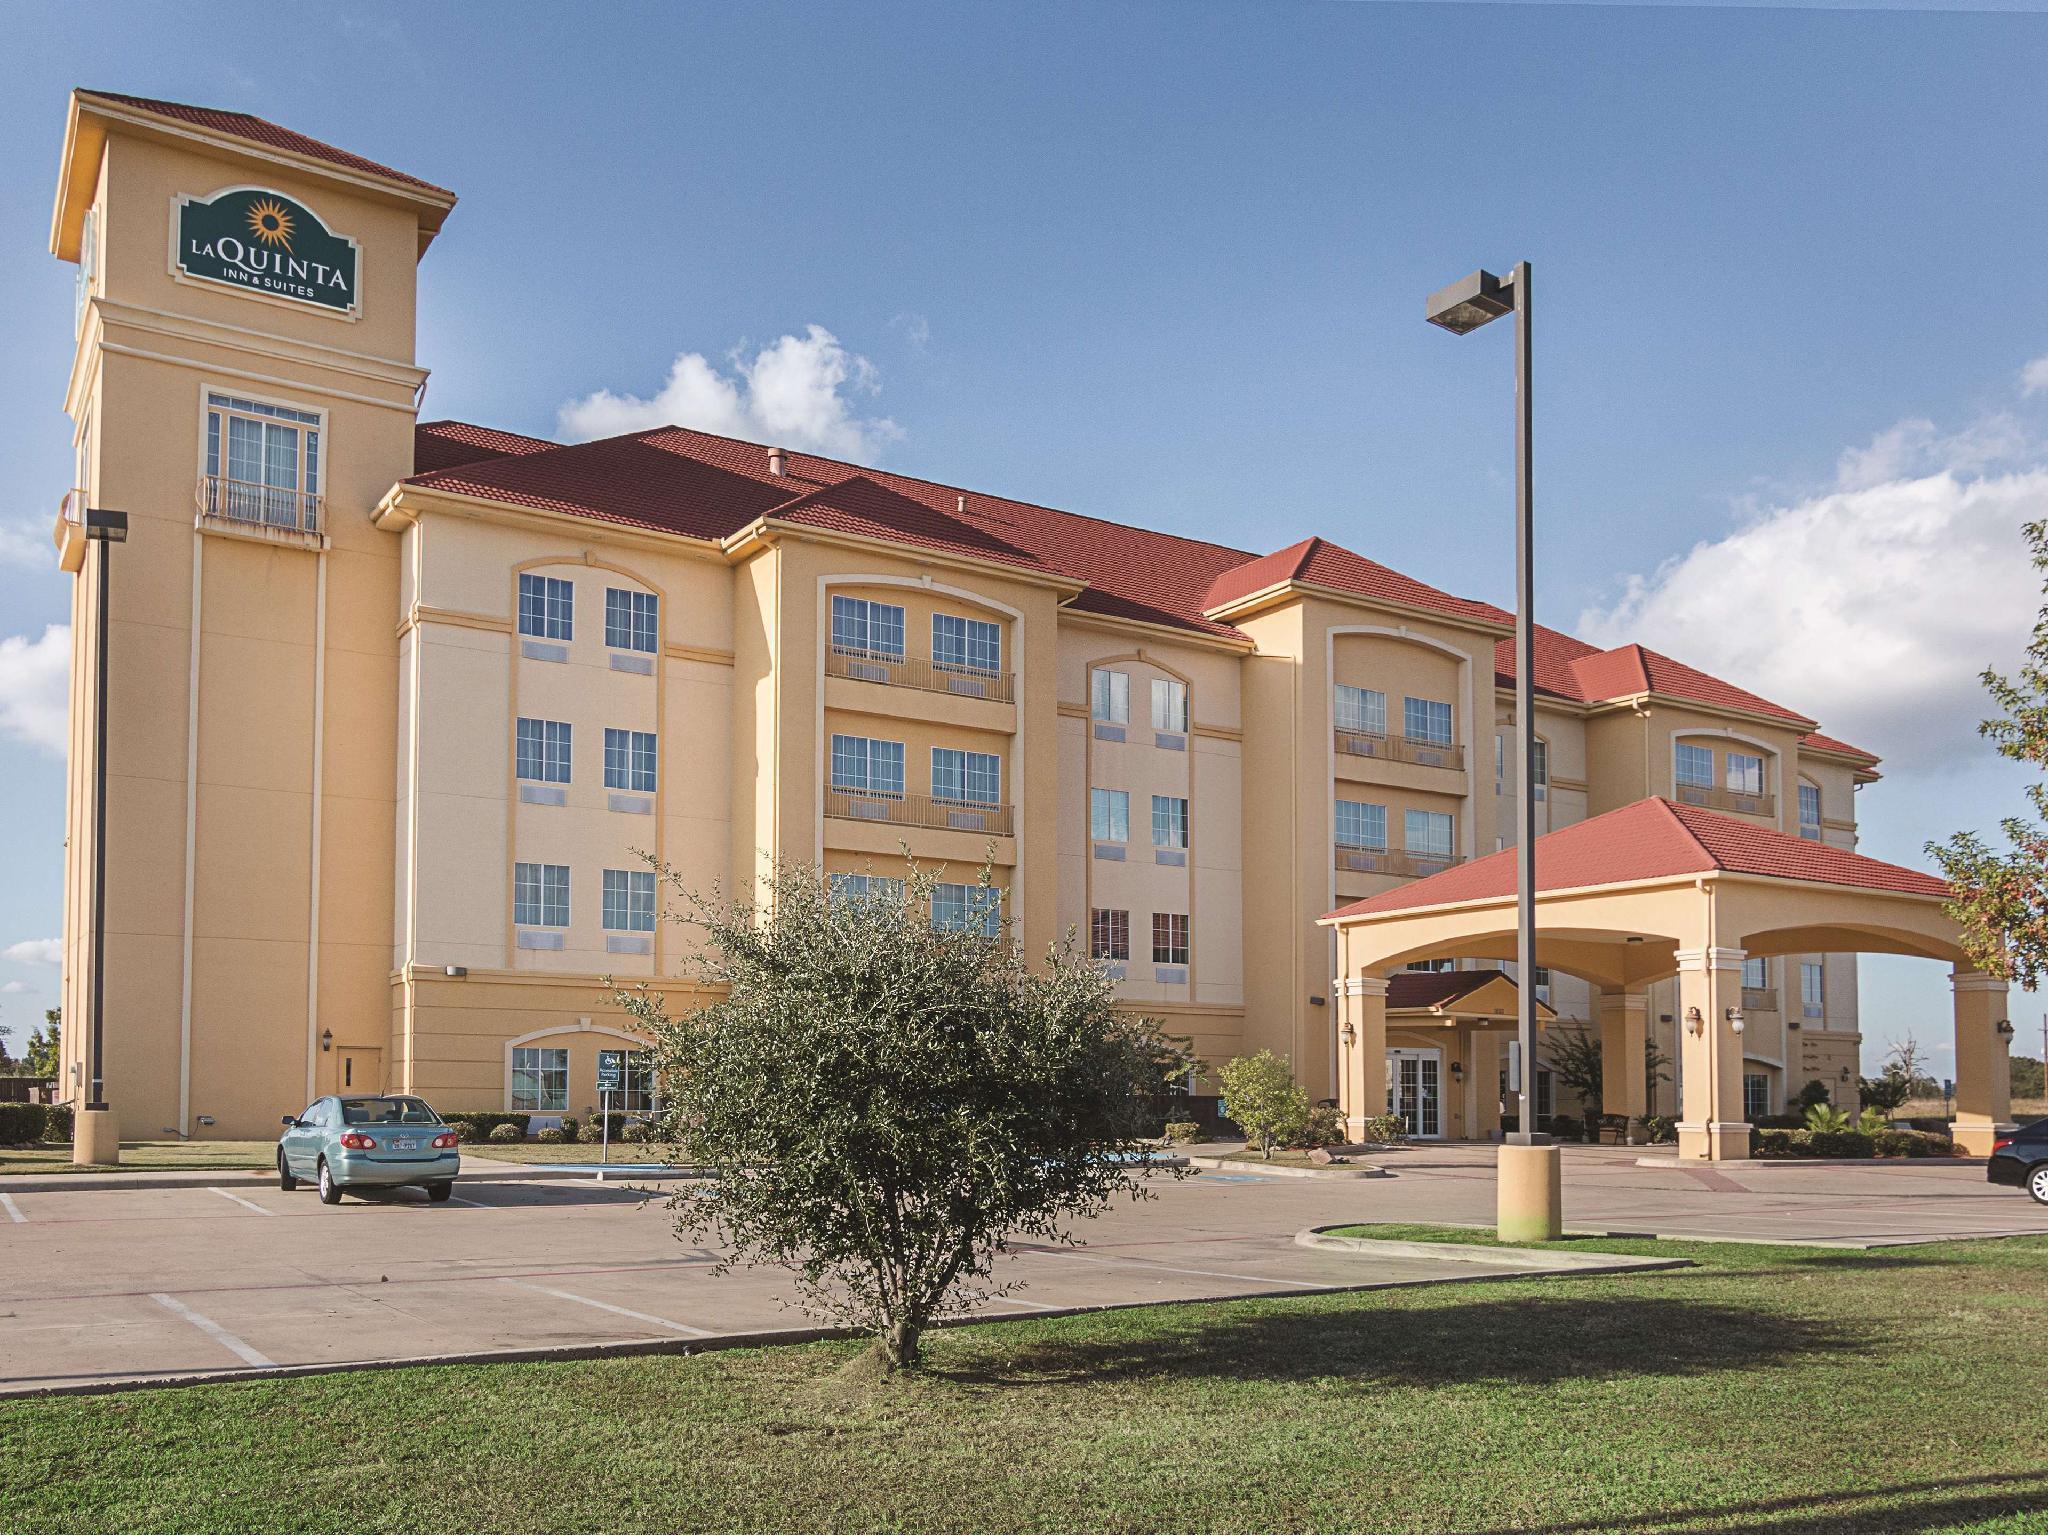 La Quinta Inn And Suites By Wyndham Mt. Pleasant